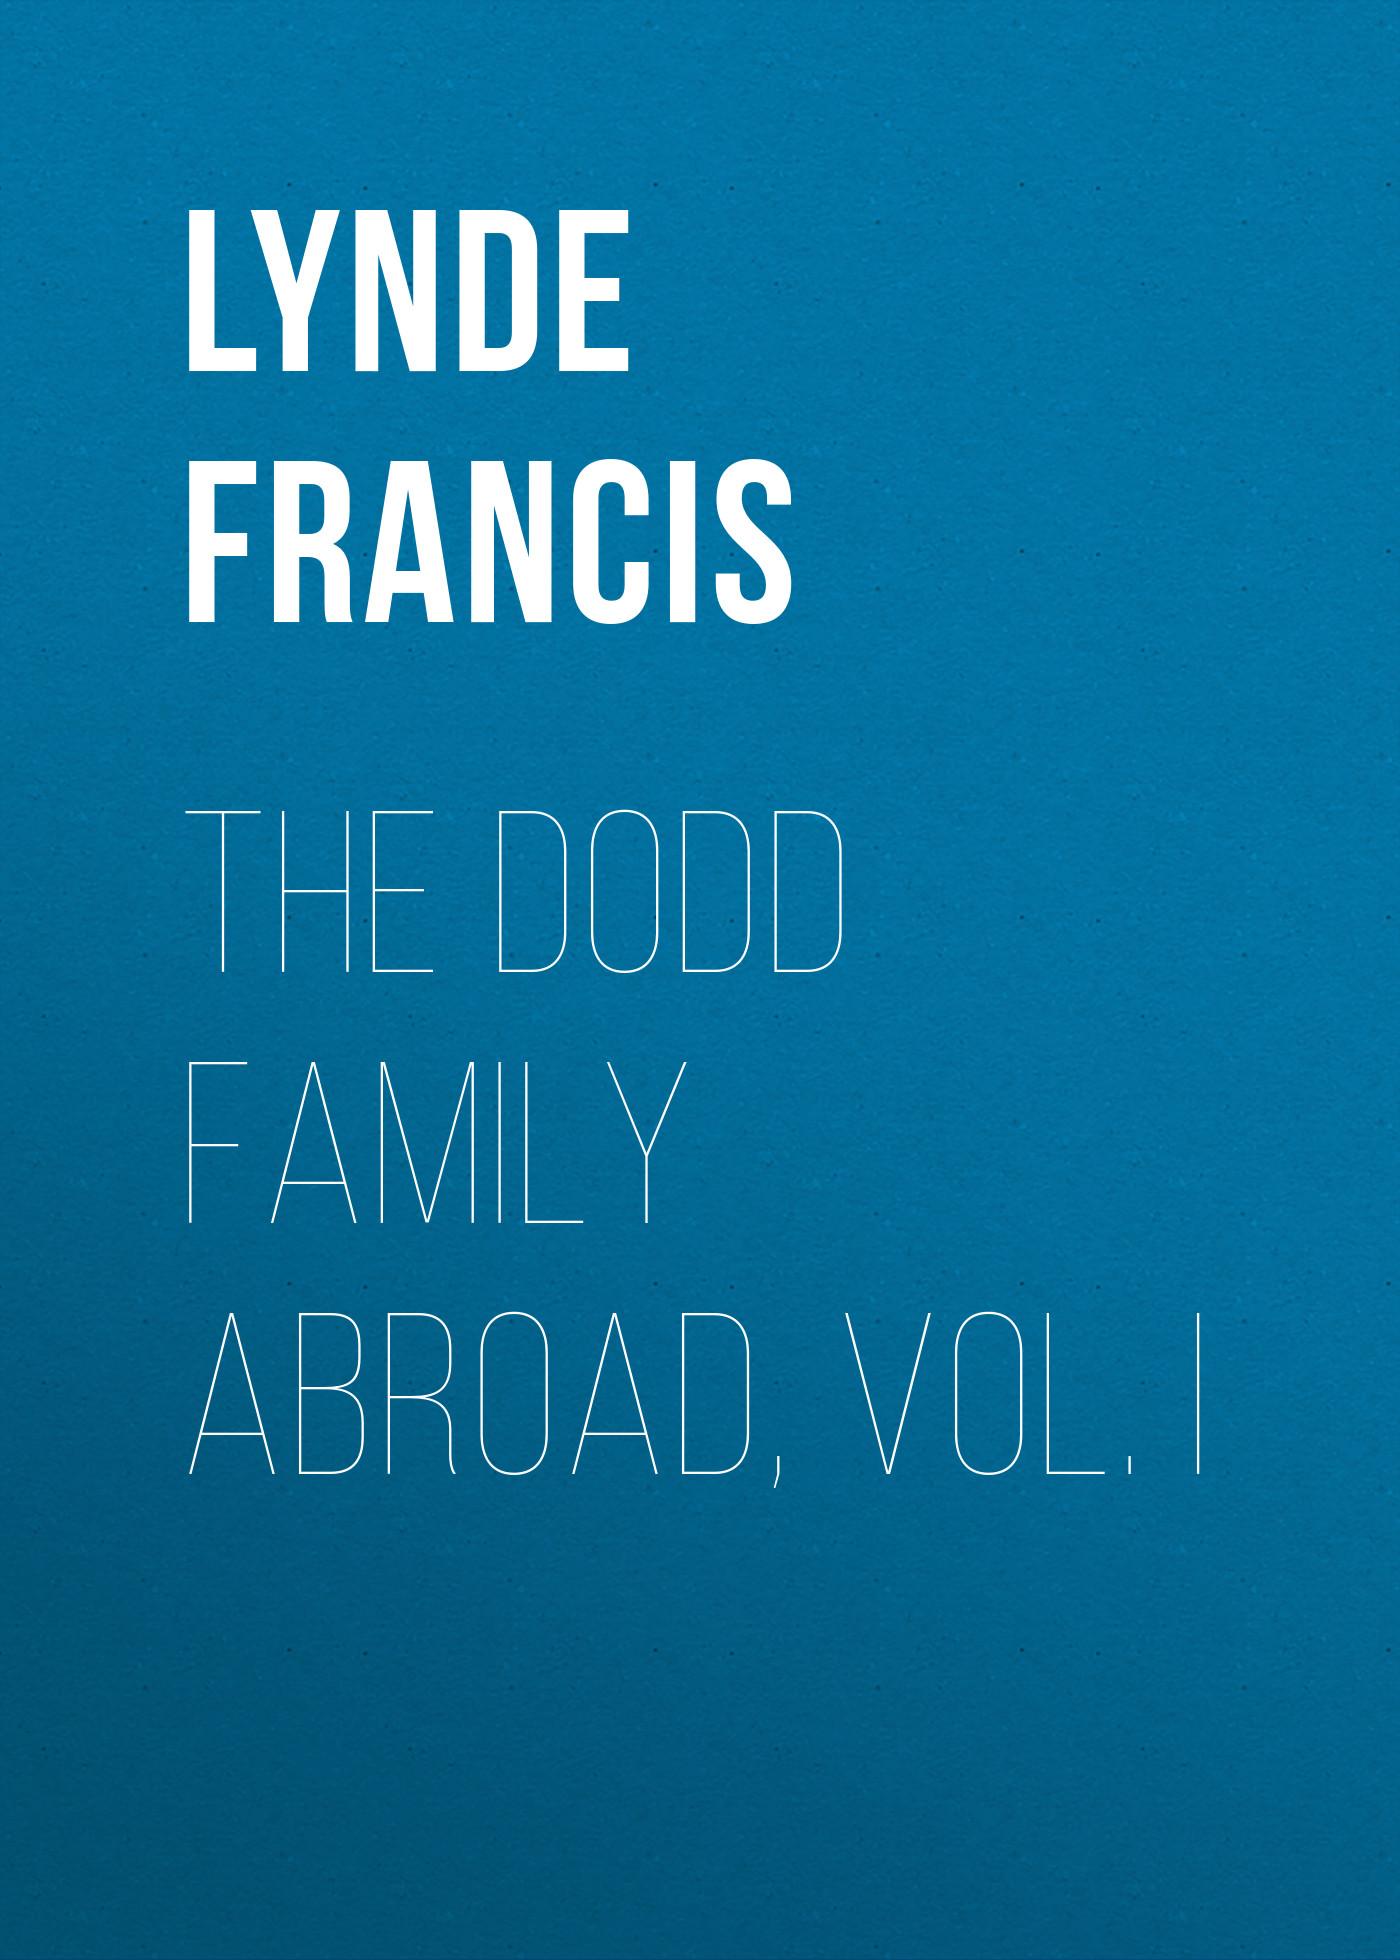 Lynde Francis The Dodd Family Abroad, Vol. I недорого